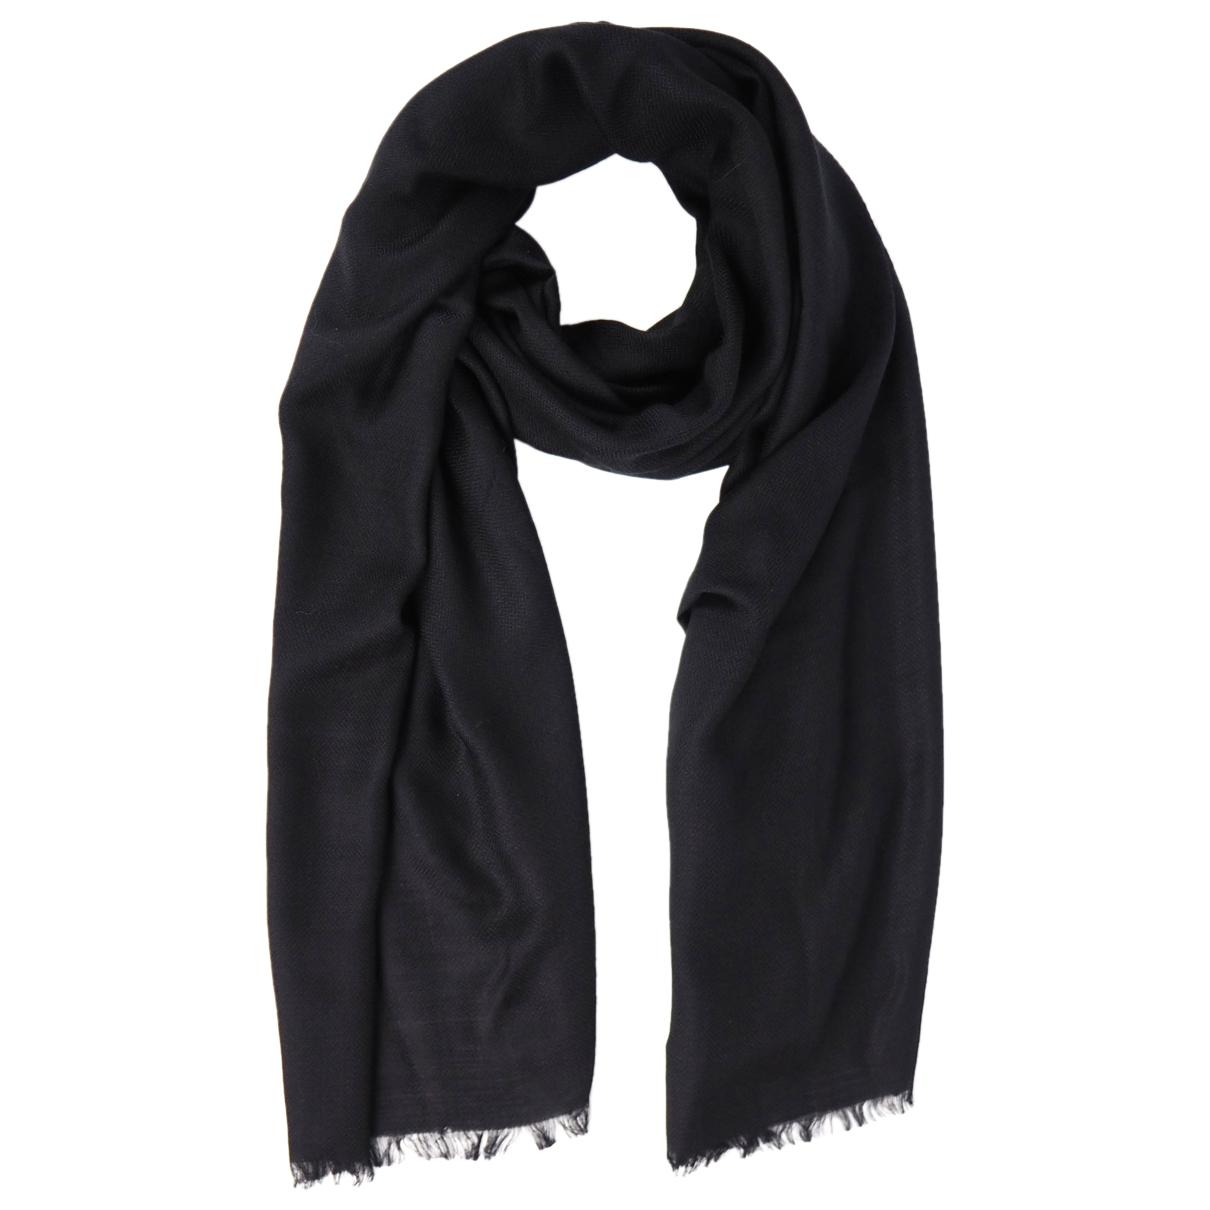 Giorgio Armani - Foulard   pour femme en cachemire - noir